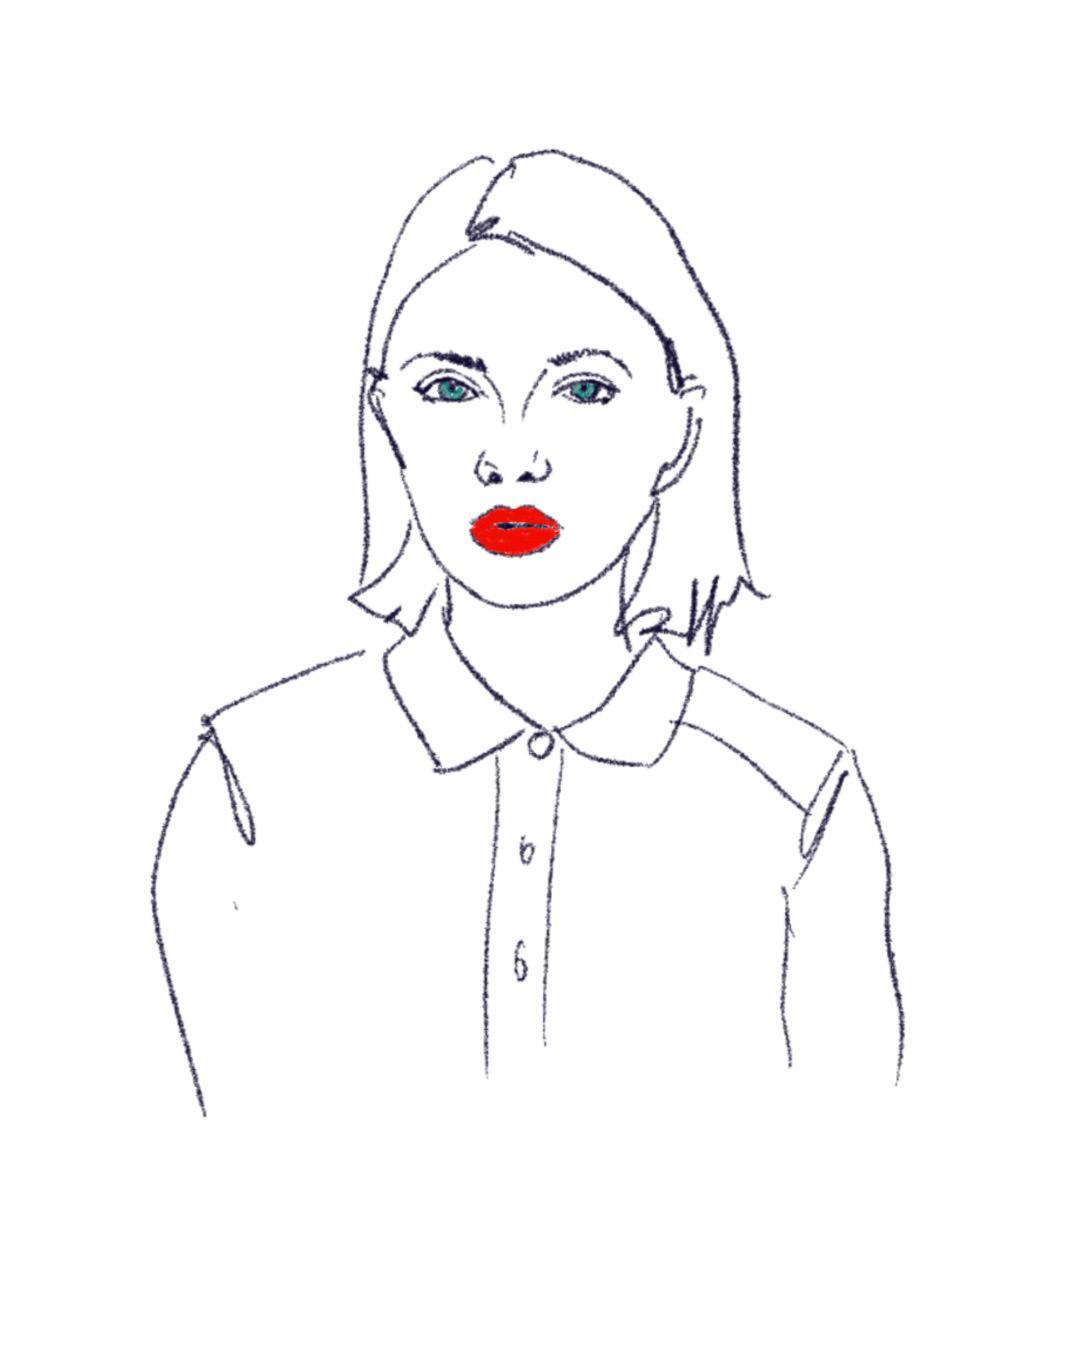 #themeetinplacequotesproject - A collaboration with the amazing illustrator Sara Nisbett @drawnontheway